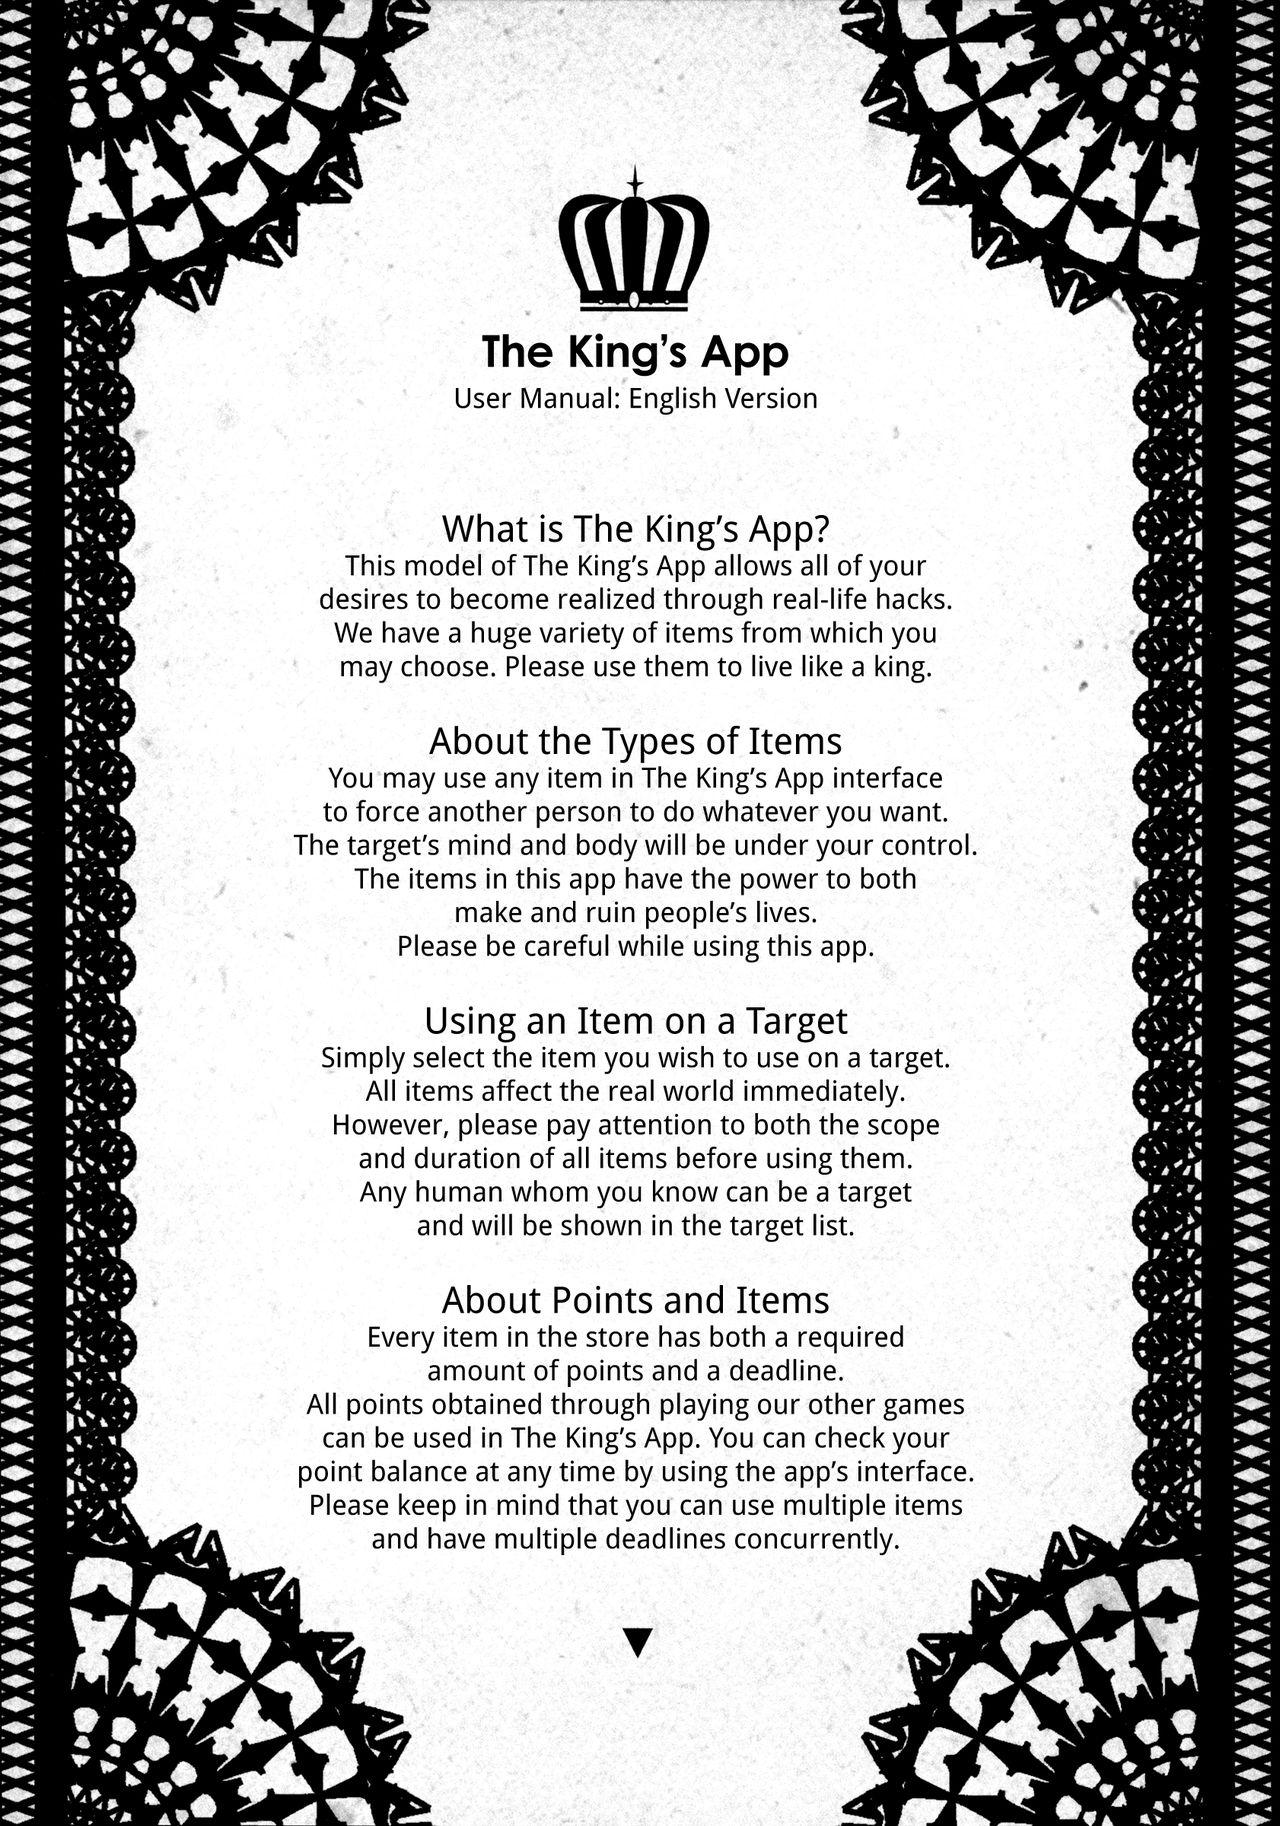 [Takatsu] Ou-sama Appli - King App [English] [TheRobotsGhost] 2